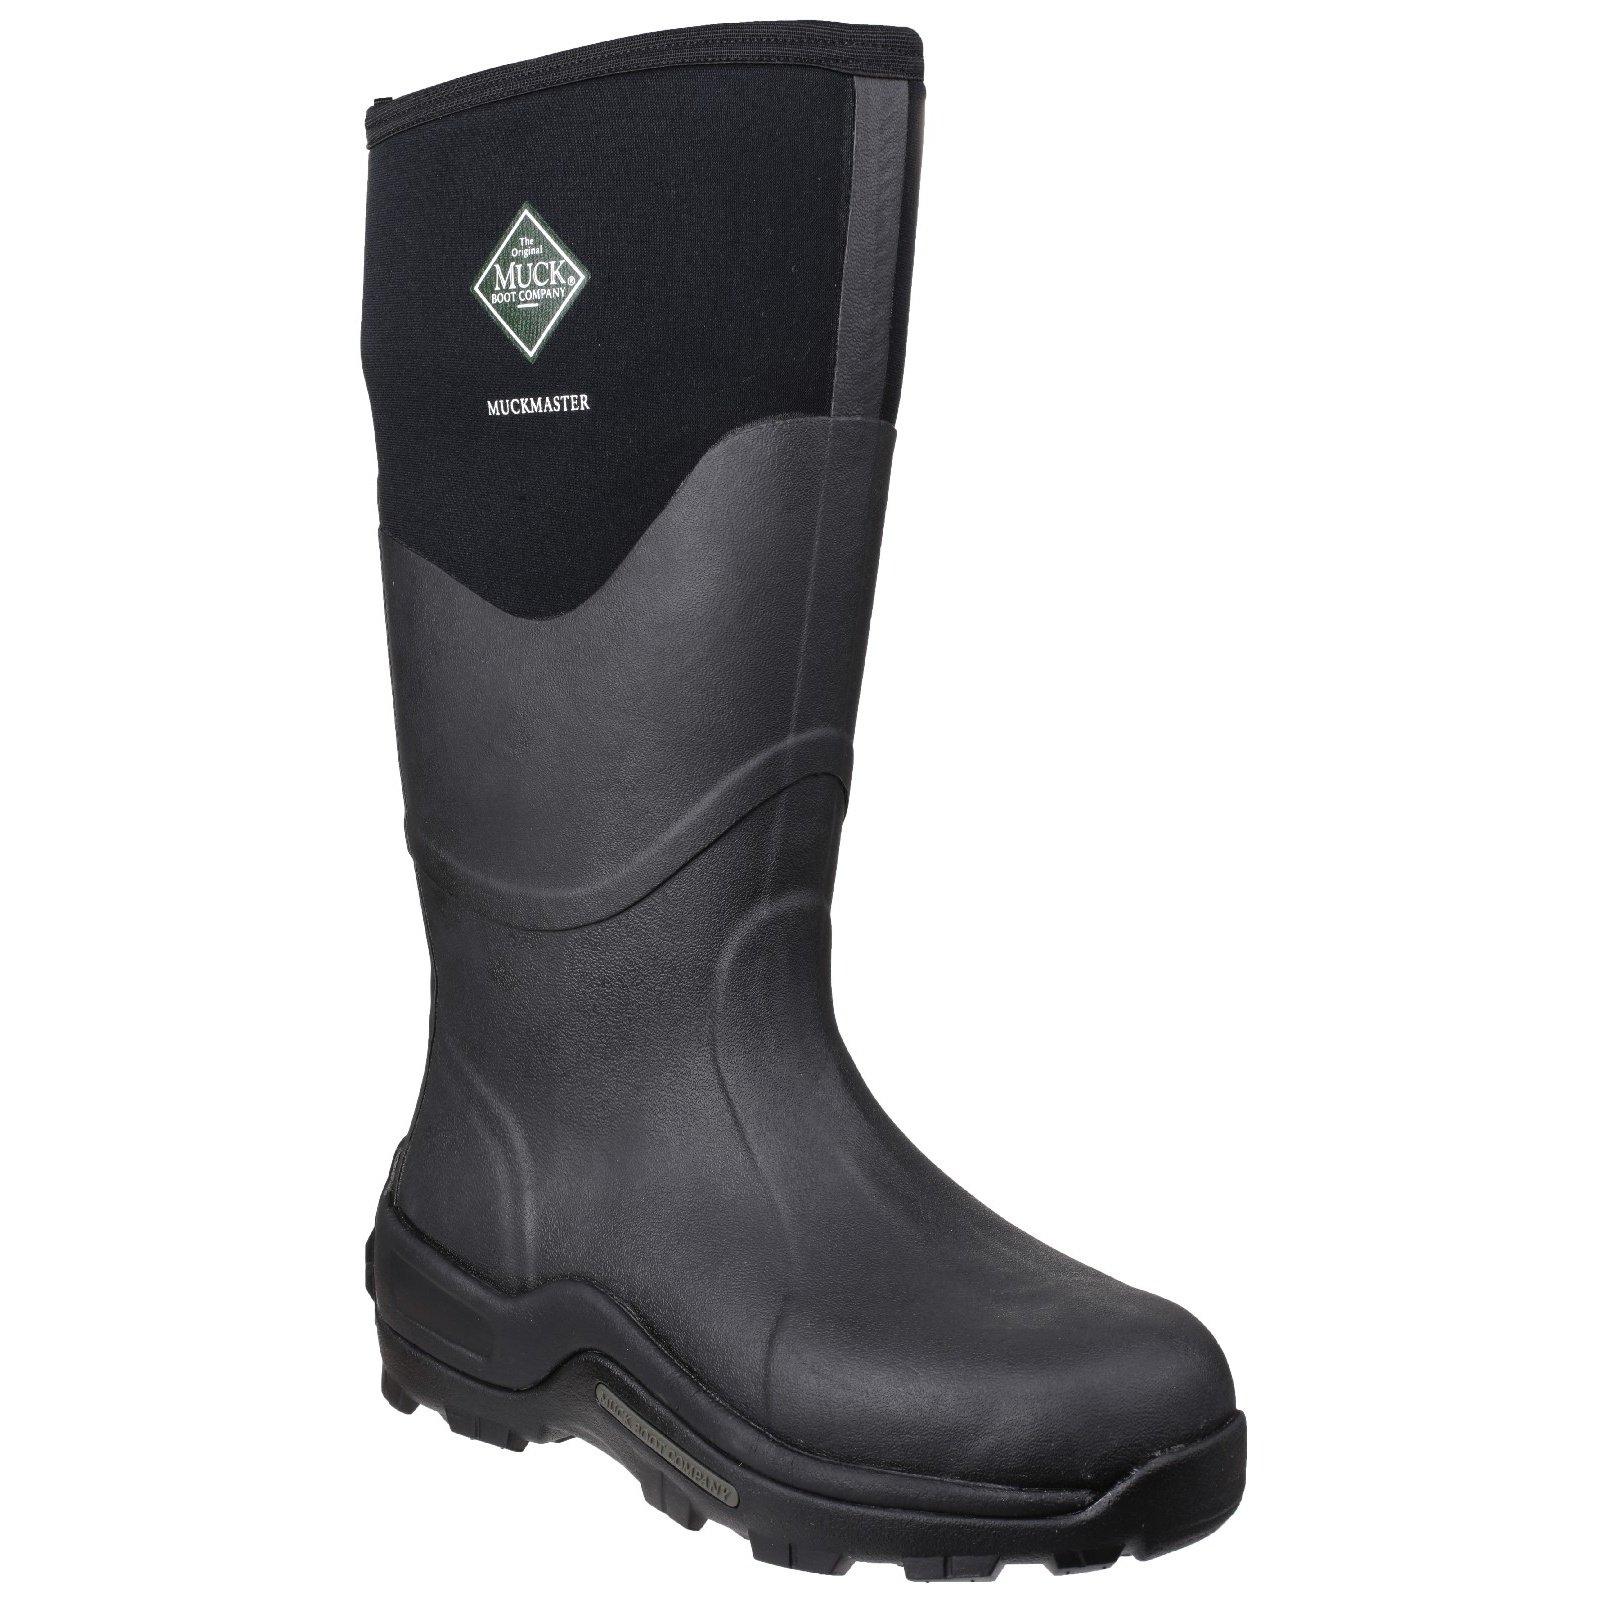 Muck Boot Unisex Muckmaster Hi Wellington Boots (7 M US / 8 W US) (Black)